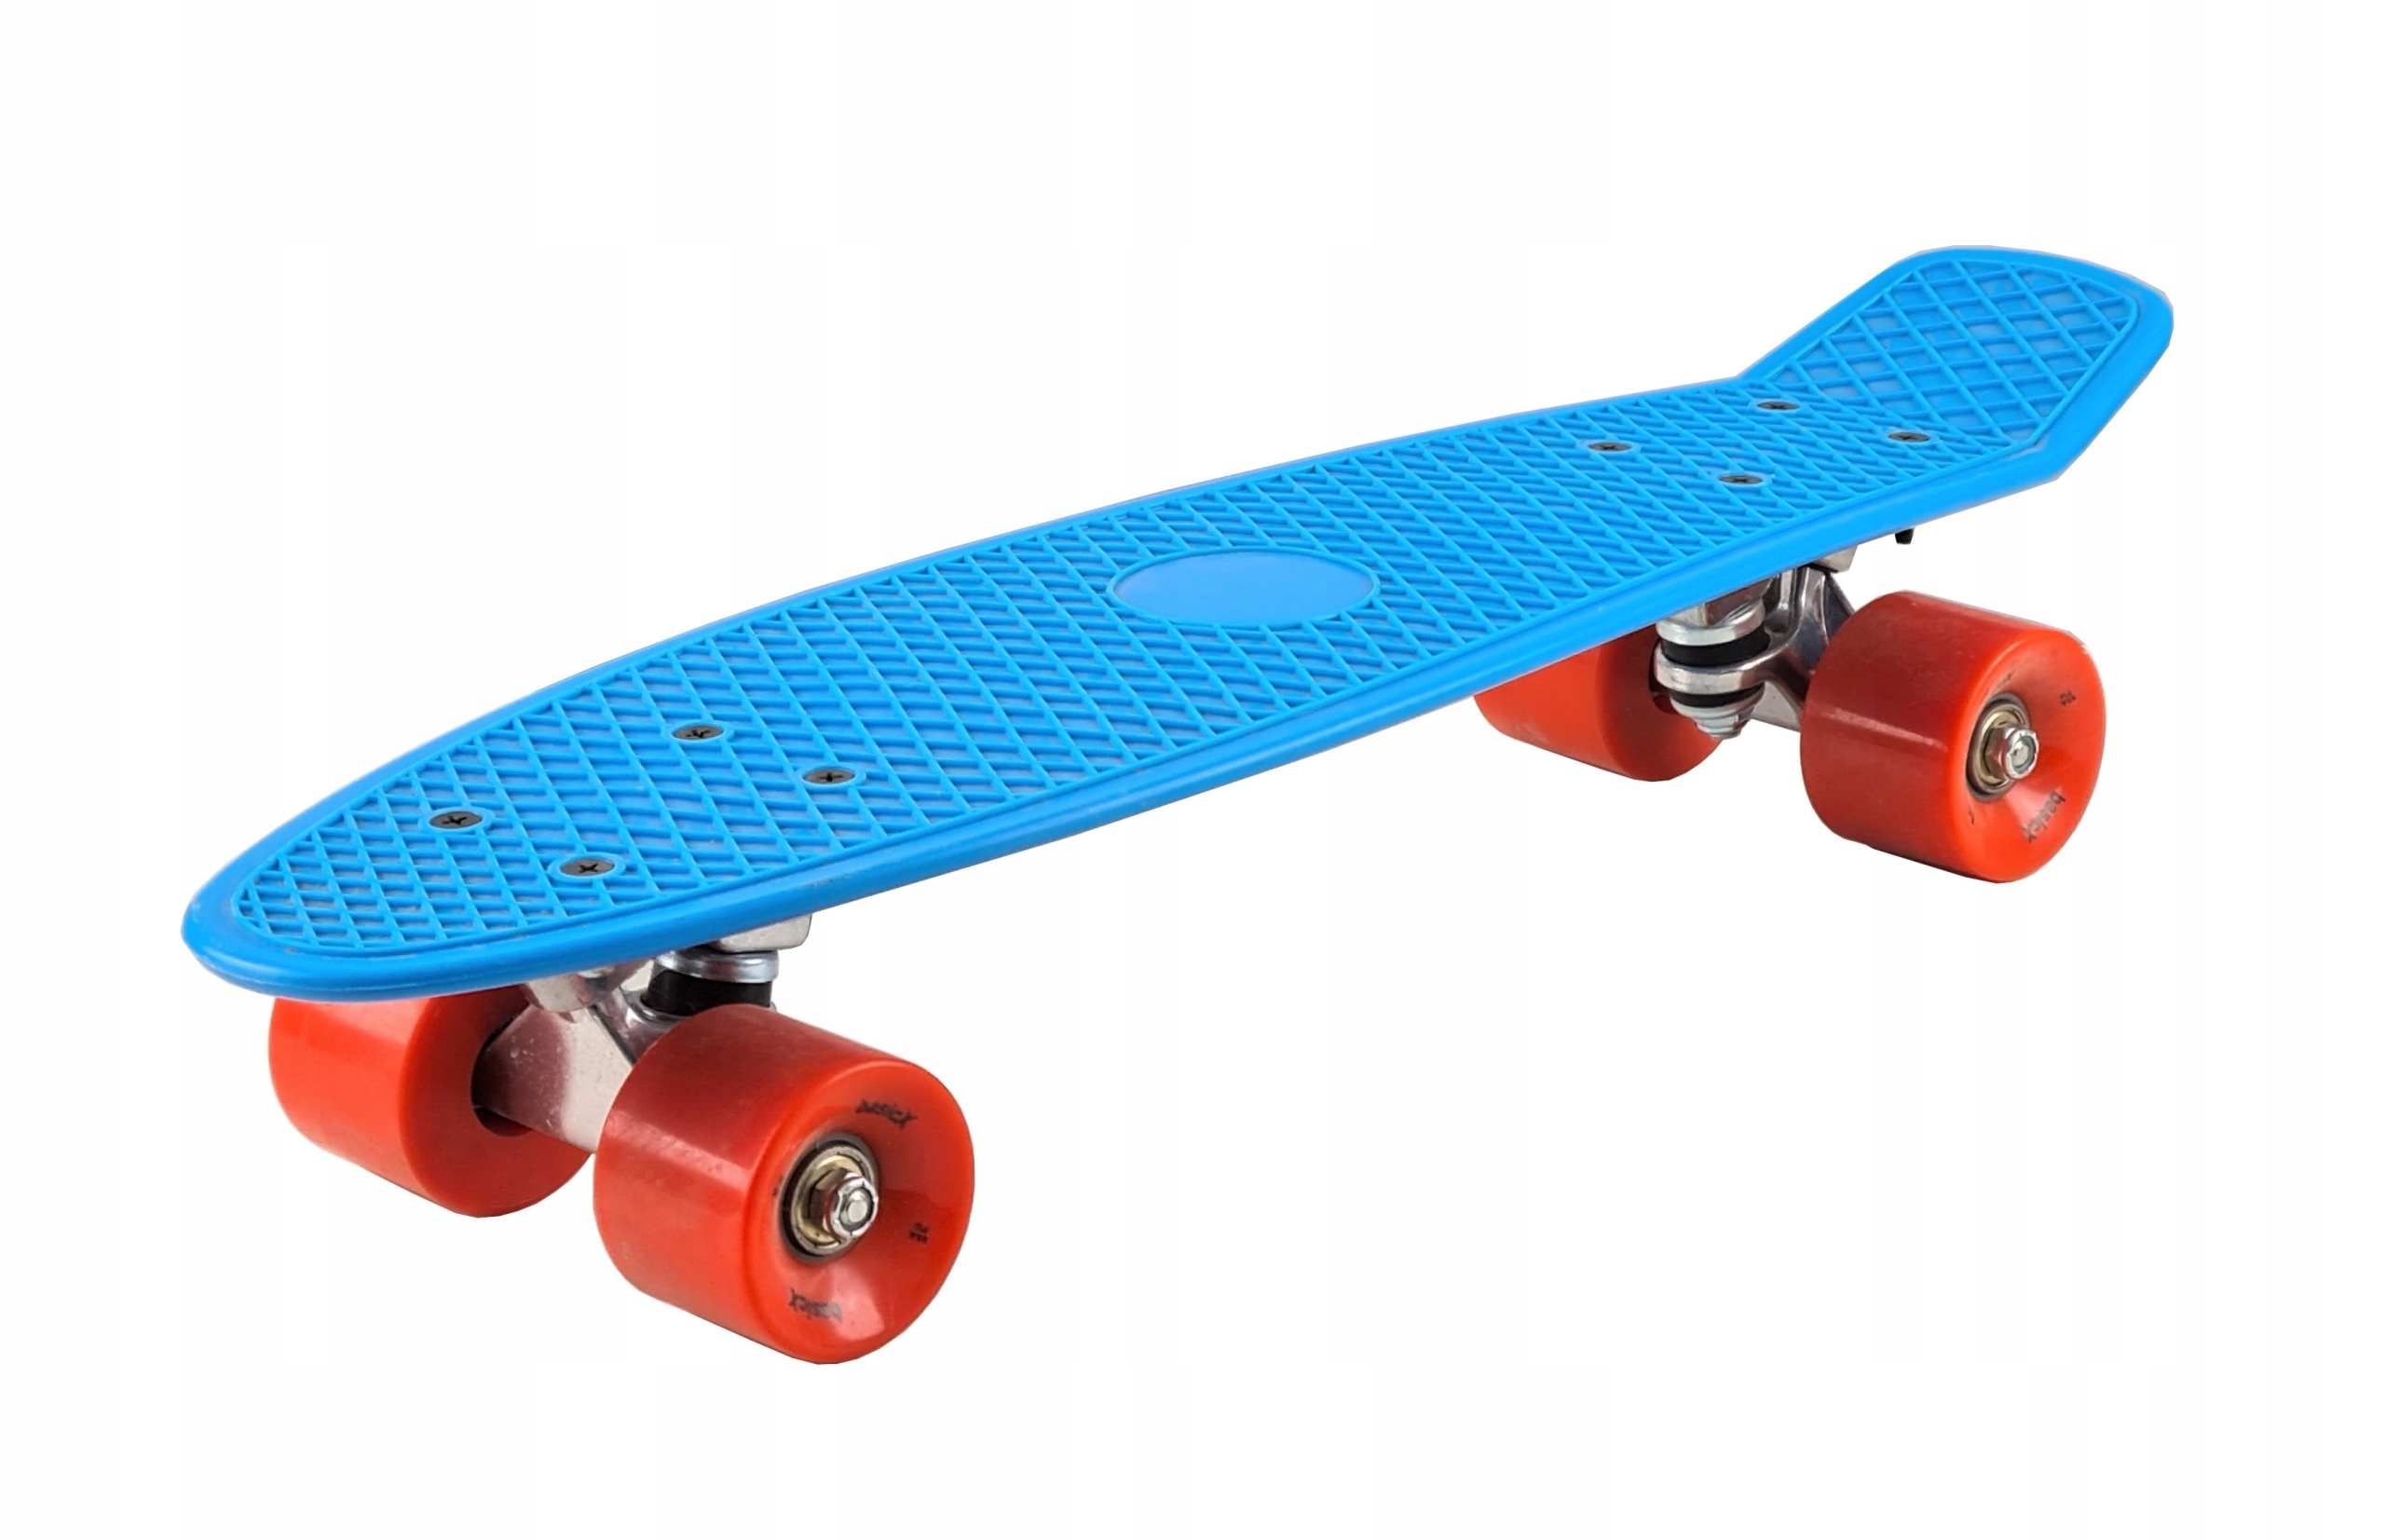 Fiszka skateboard doska ABEC-7 hrubé neónové kolesá